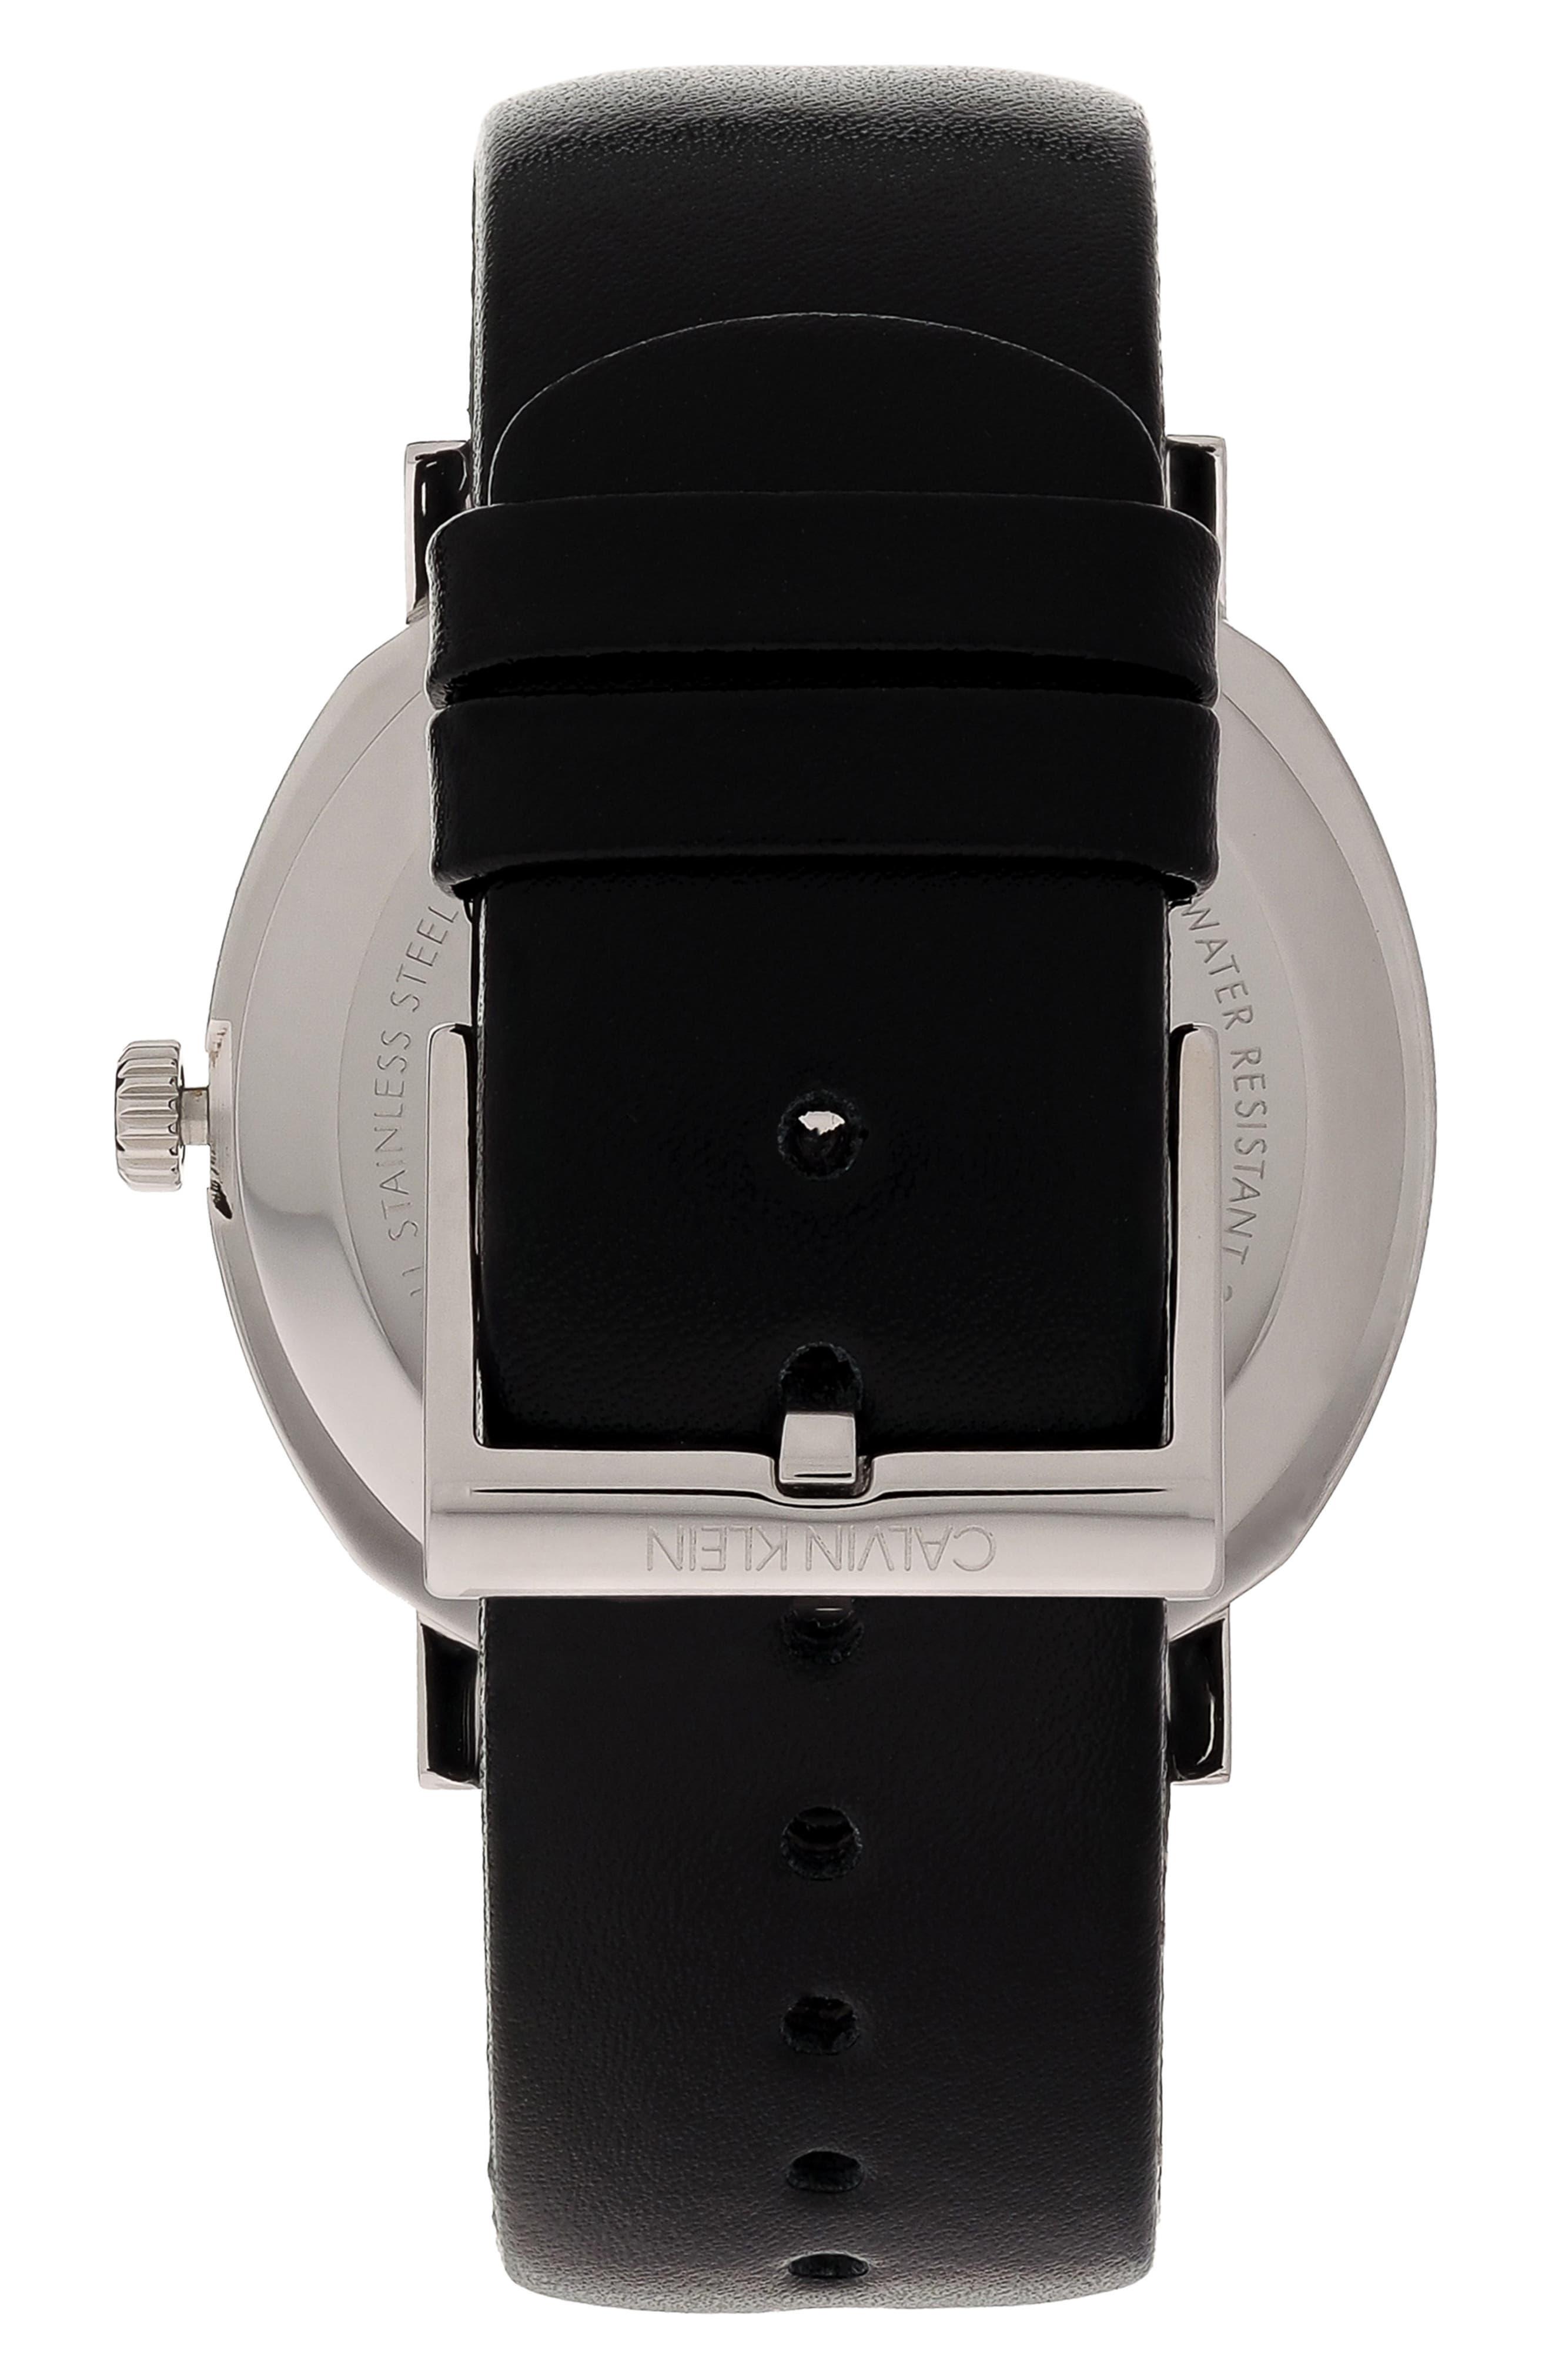 CALVIN KLEIN,                             Posh Leather Band Watch, 40mm,                             Alternate thumbnail 2, color,                             BLACK/ SILVER/ BLACK